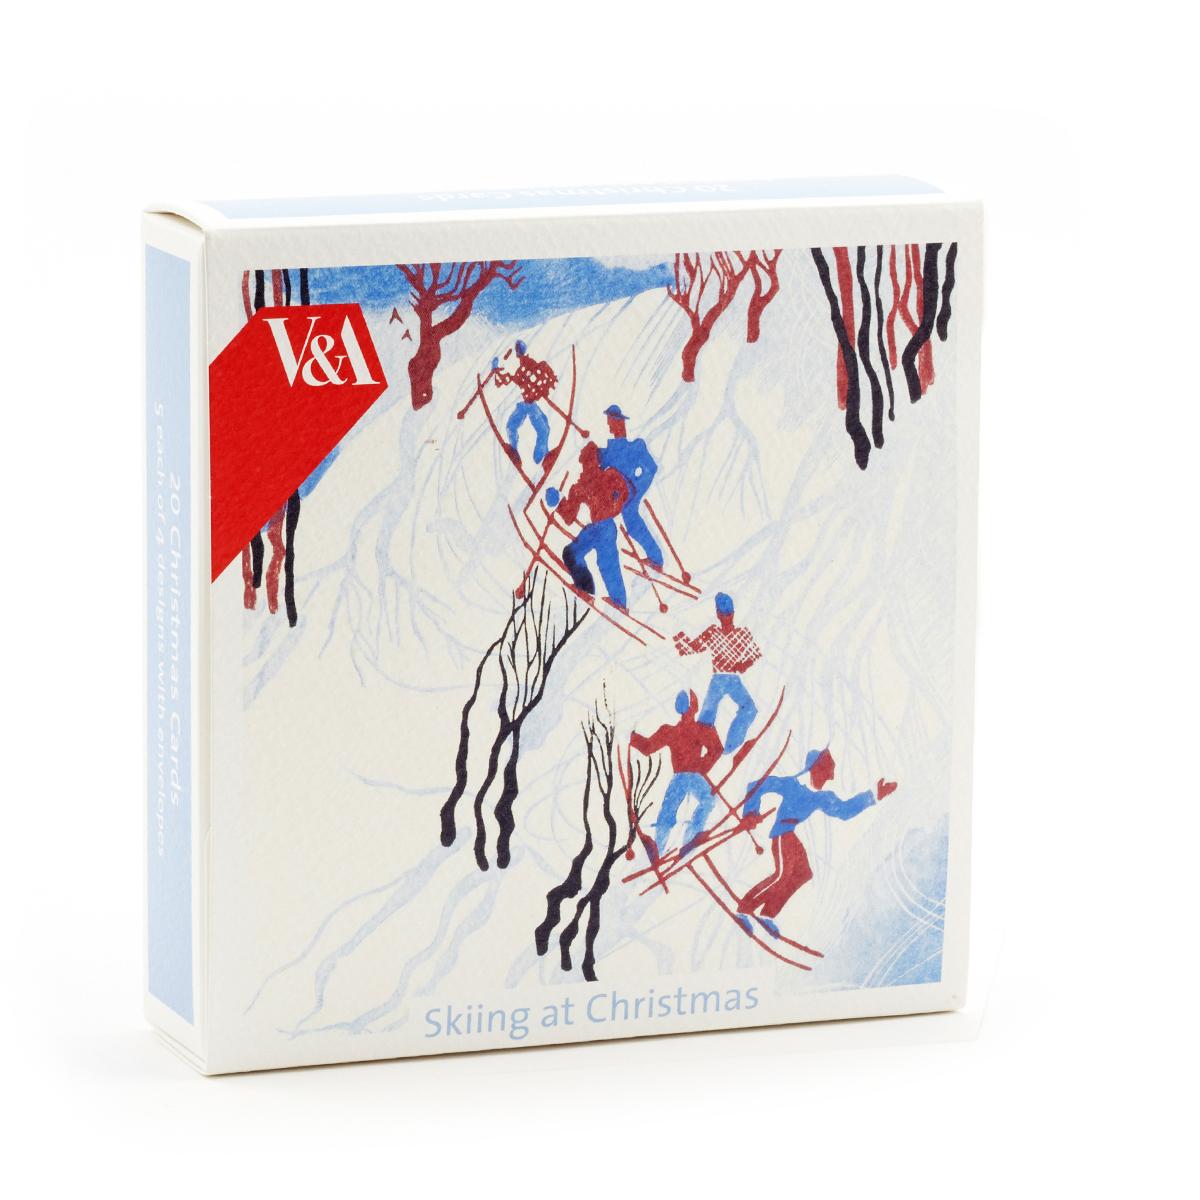 20 Skiing at Christmas cards set of 4 designs